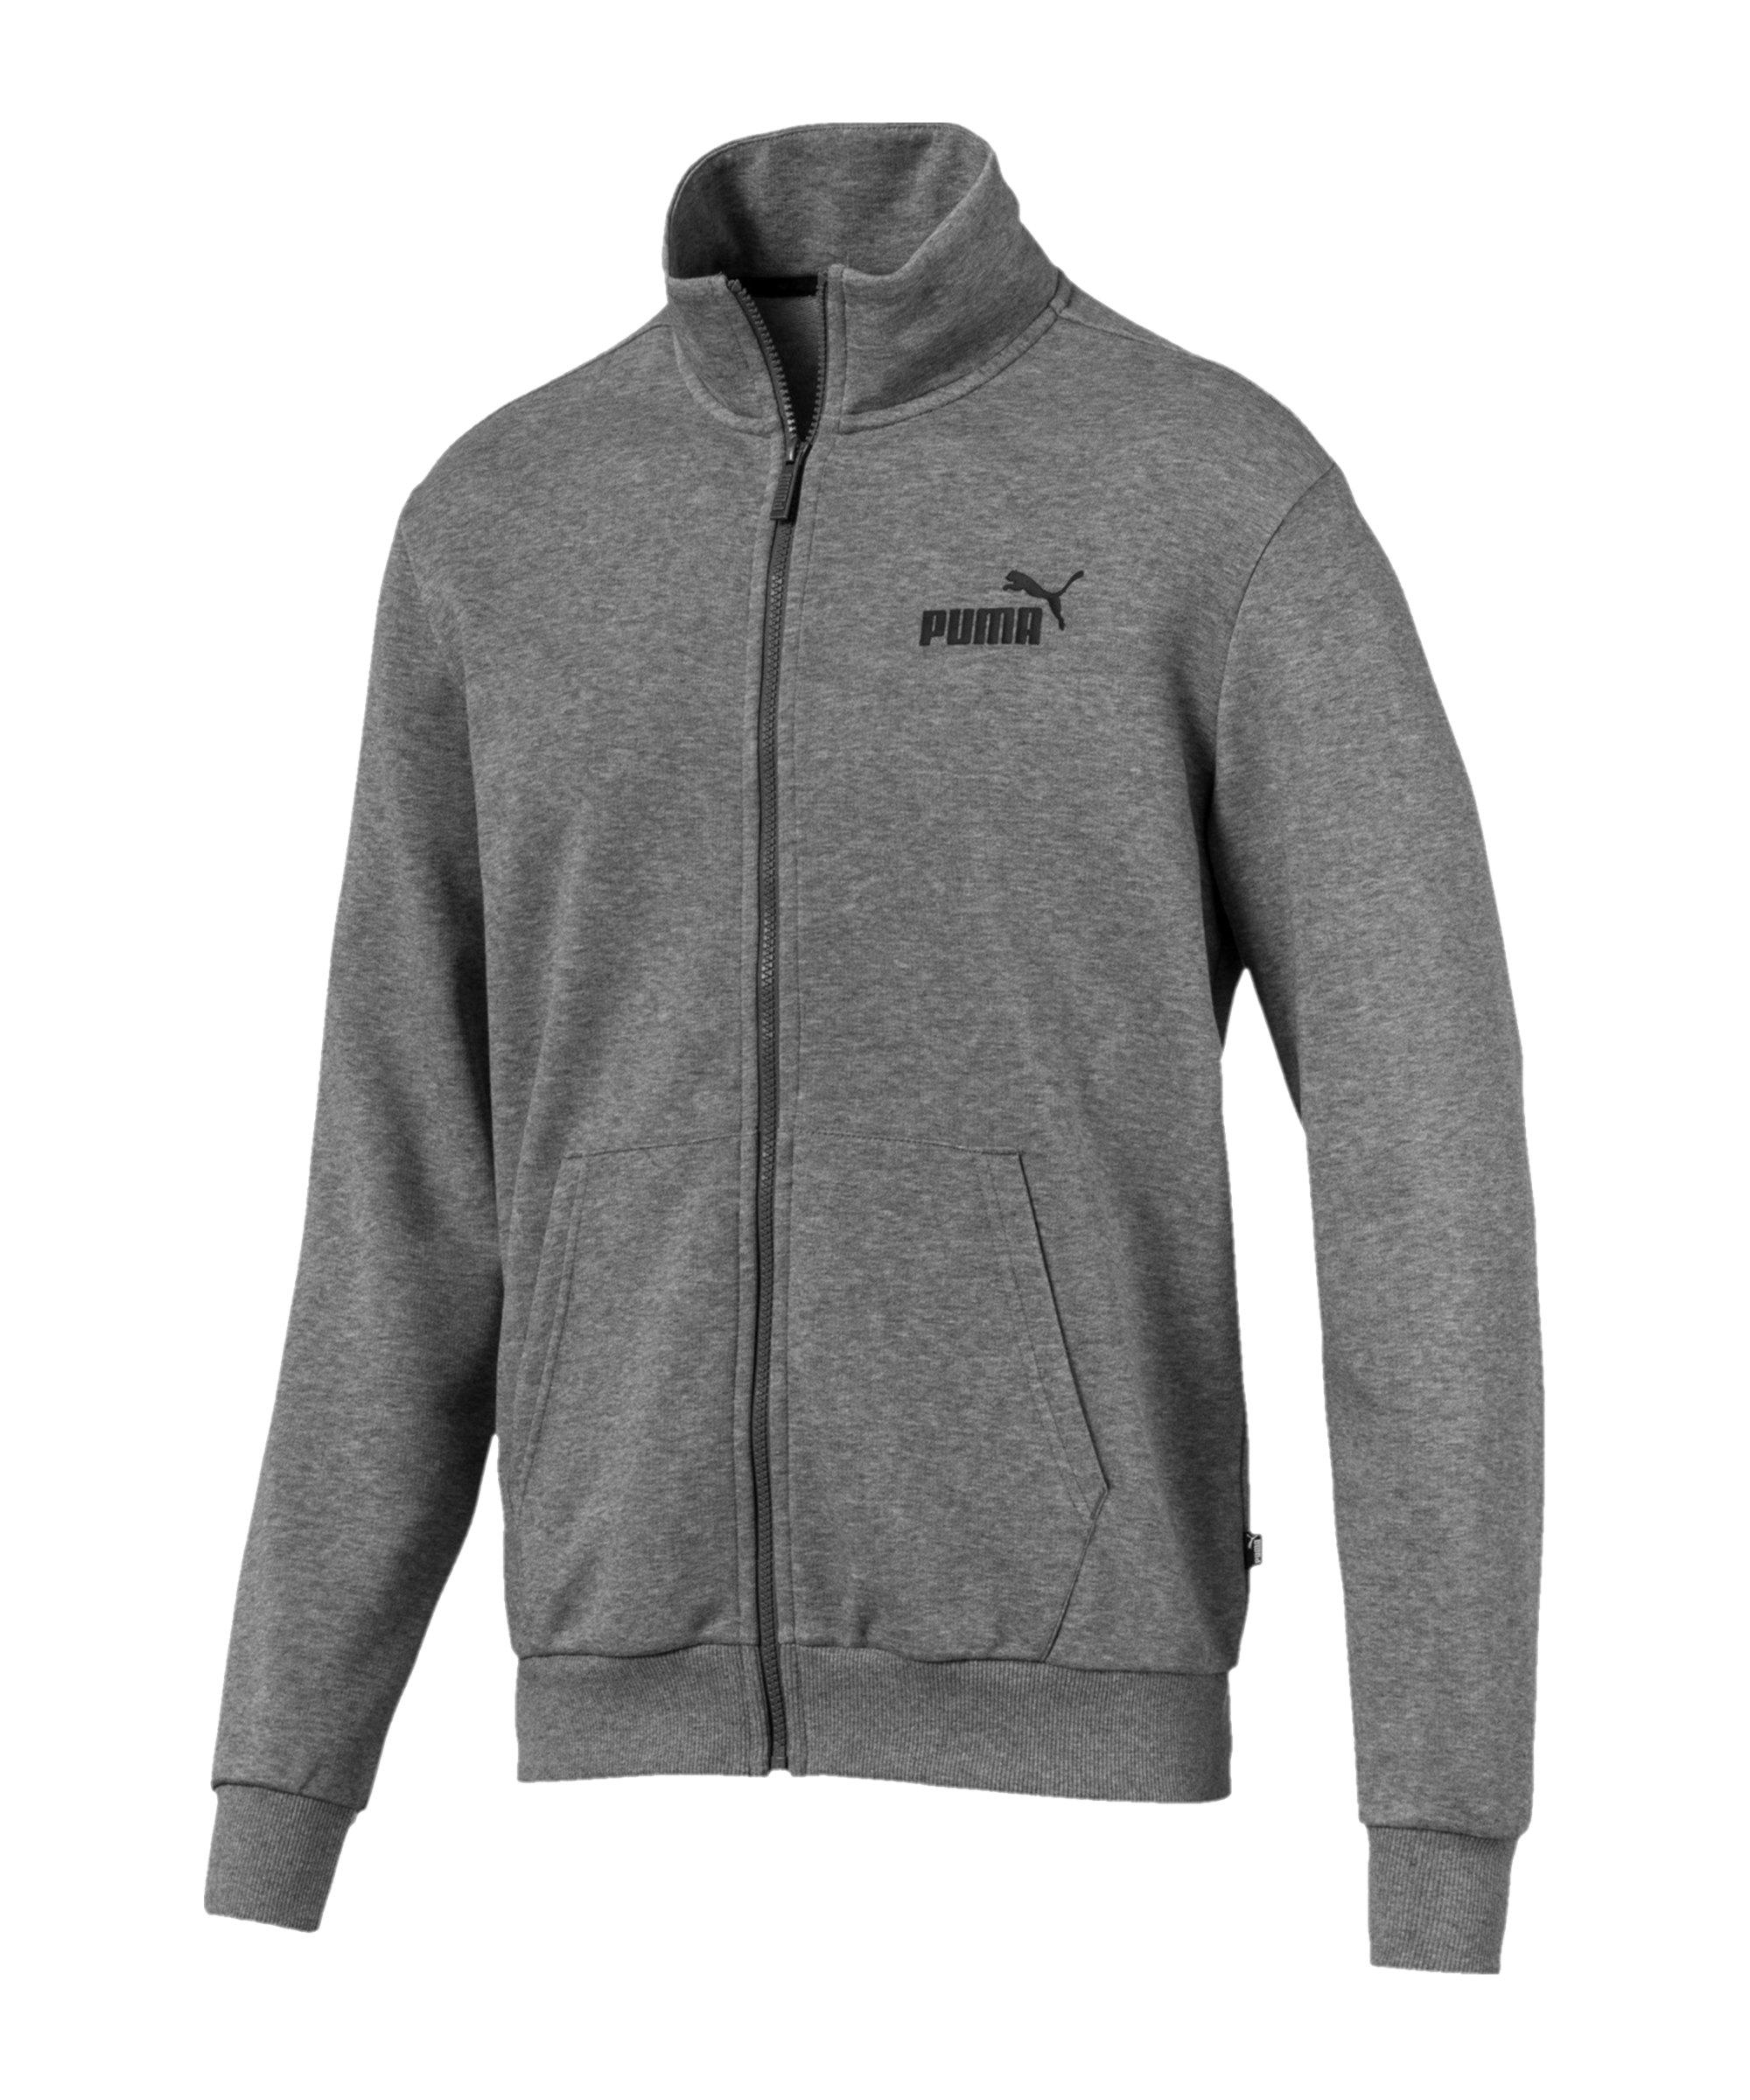 PUMA Essentials Track Trainingsjacke Grau F03 - grau